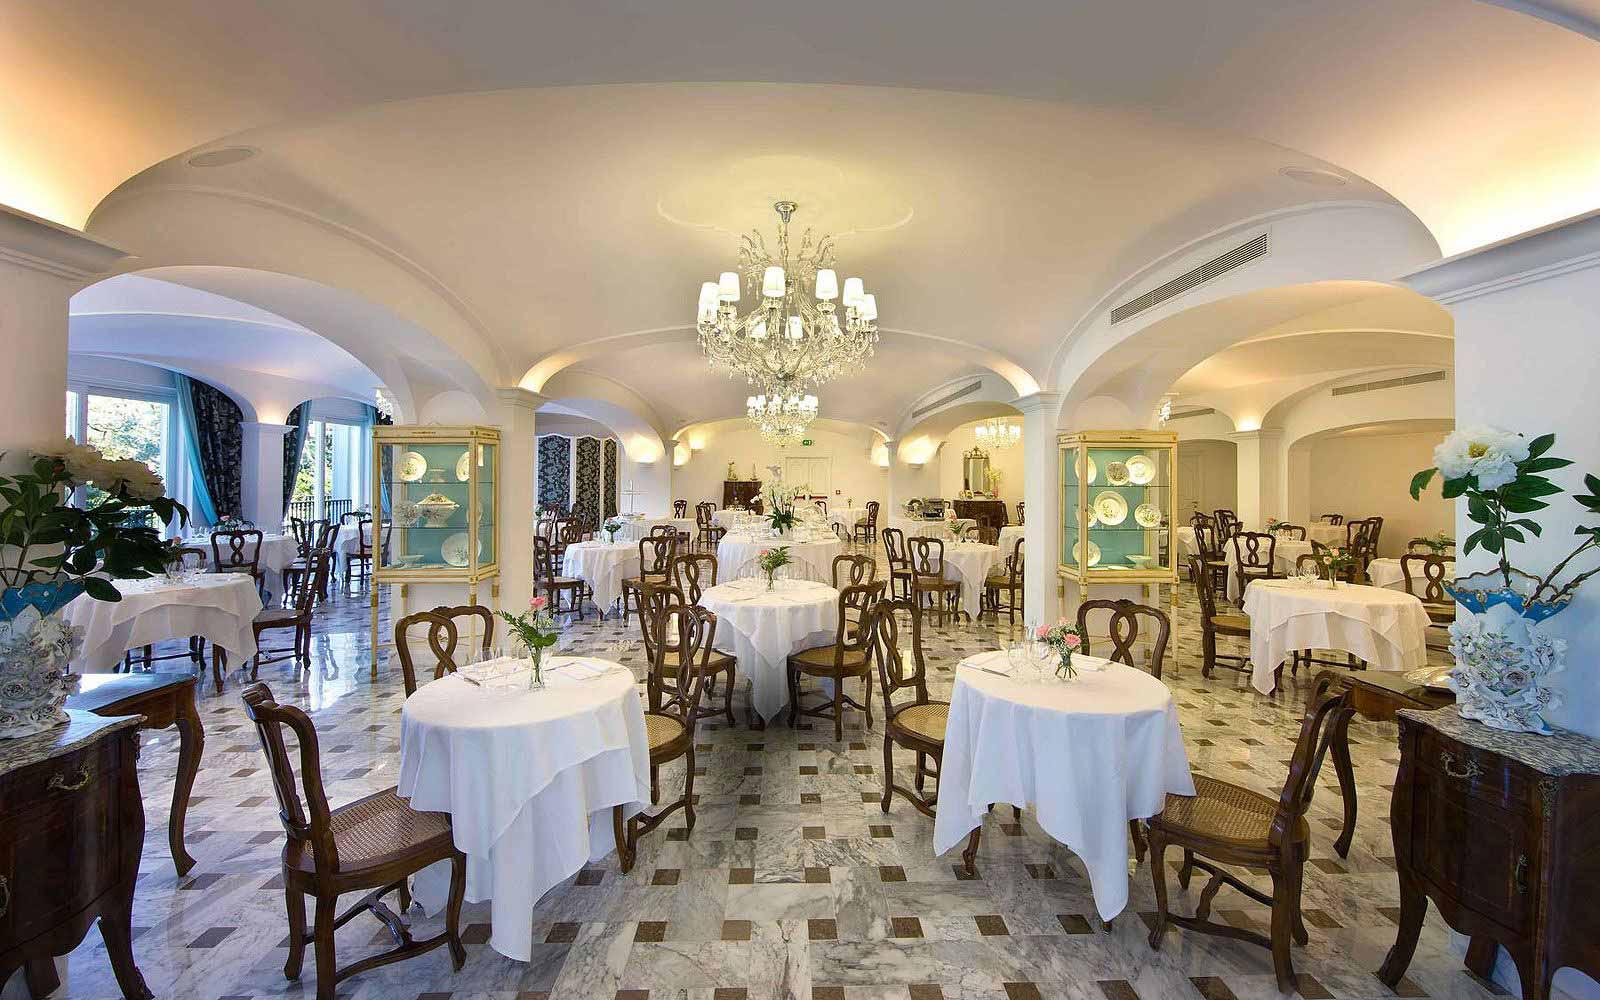 Tiffany Restaurant at the Grand Hotel La Favorita